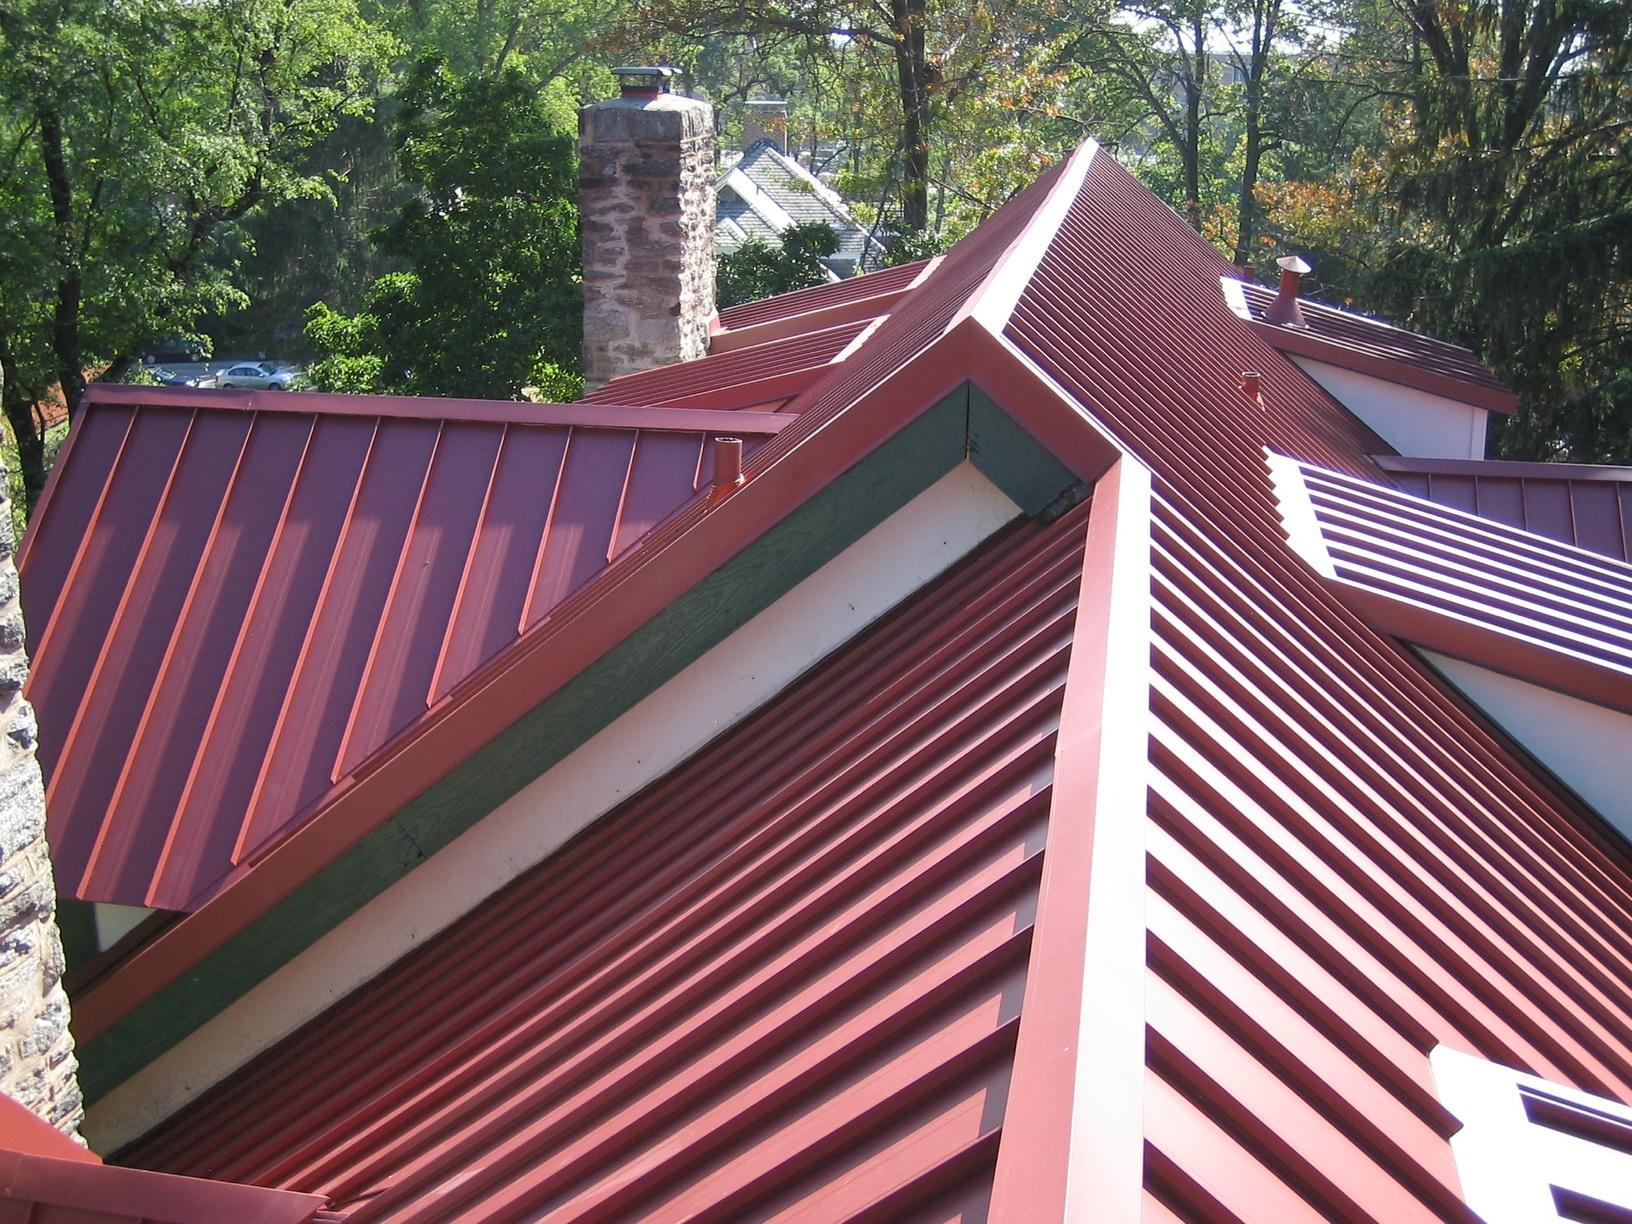 Red Metal Madison, NJ Standing Seam Roof